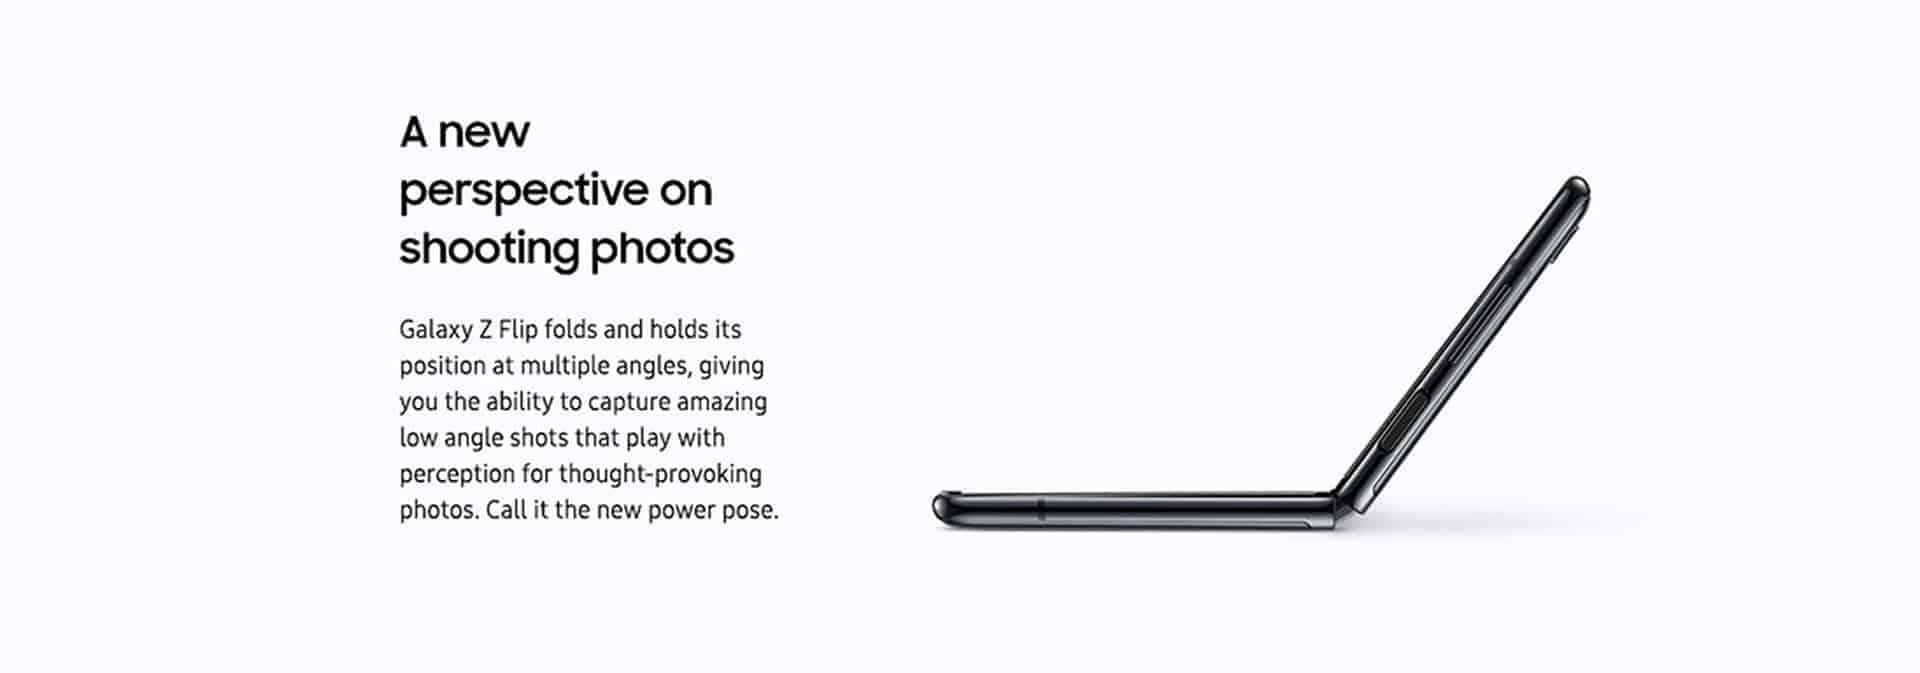 Samsung Galaxy Z Flip marketing image 6